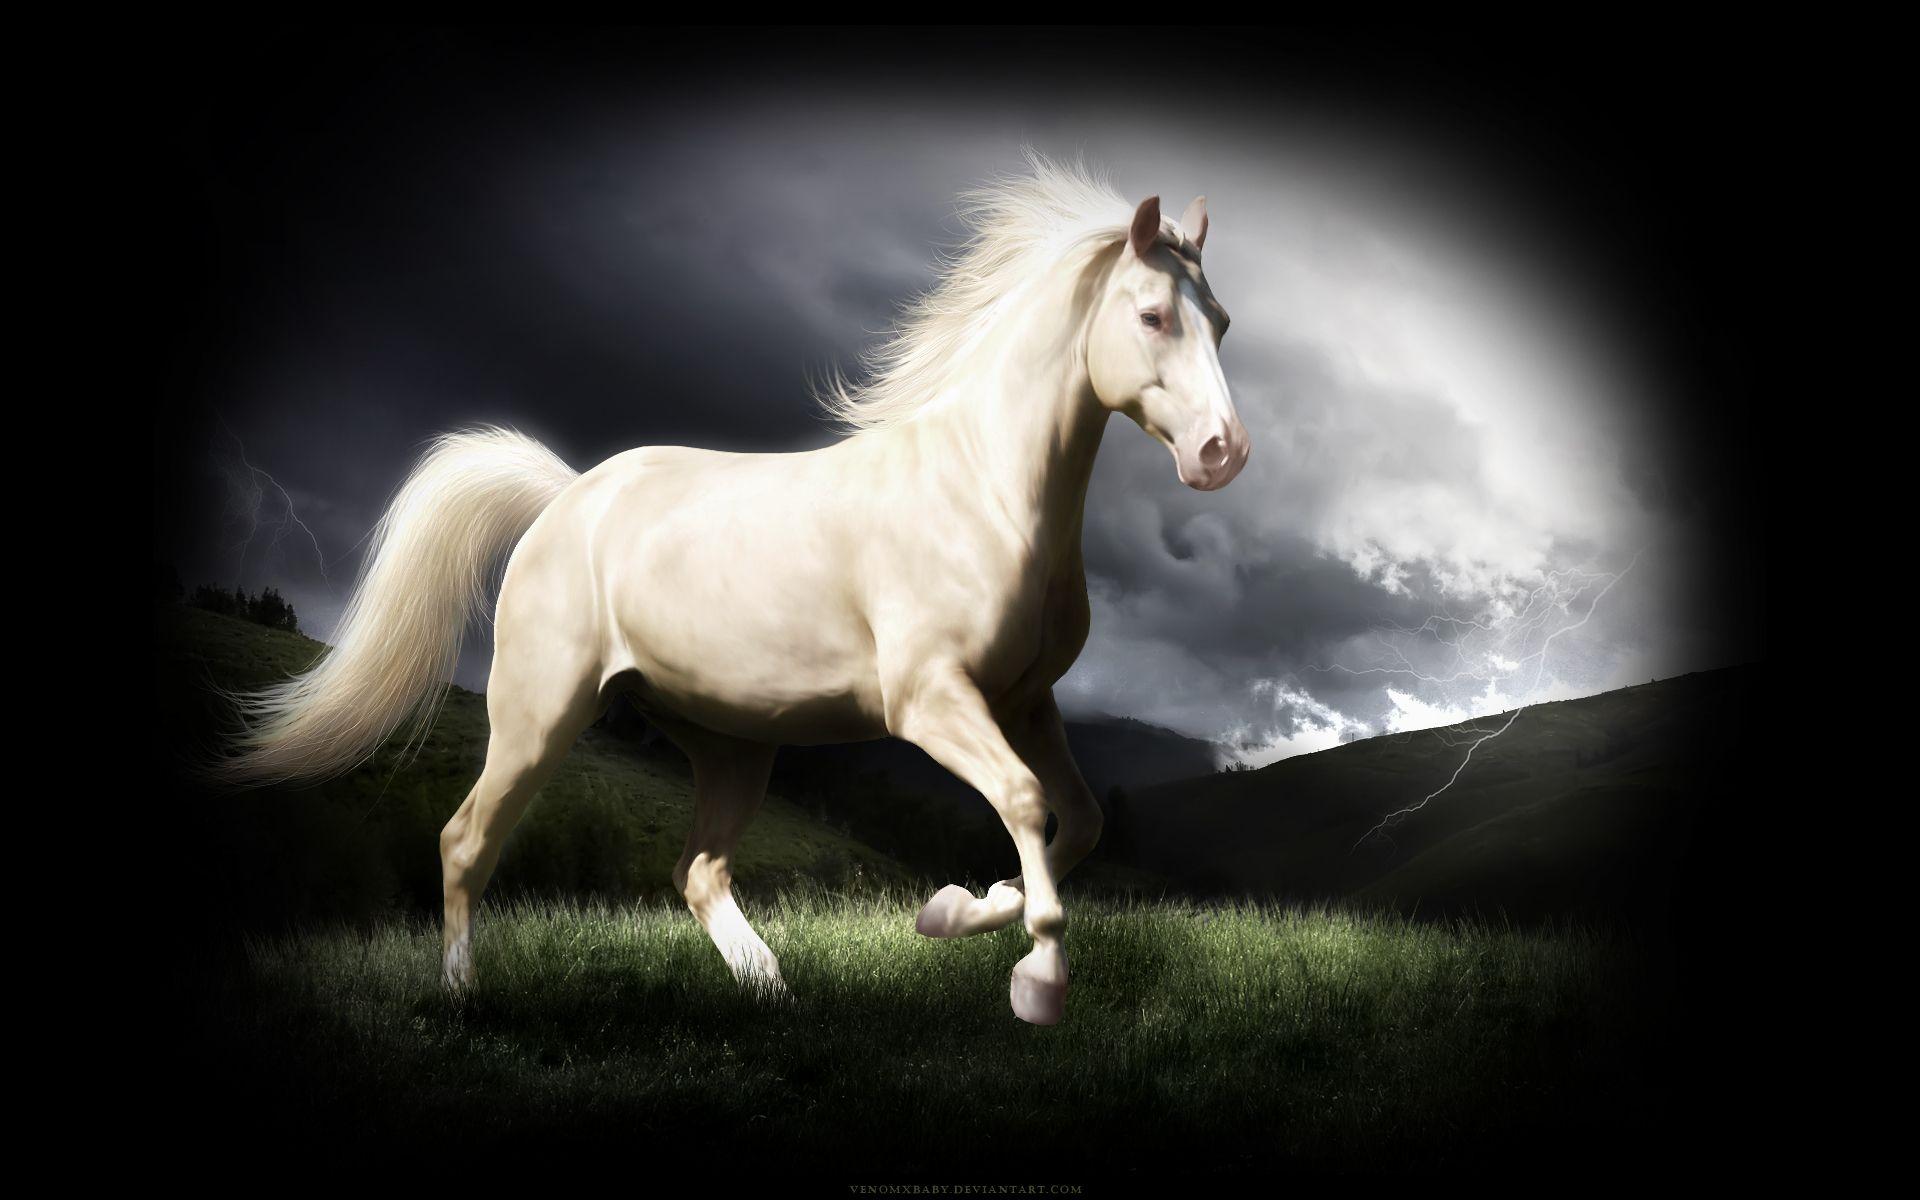 Must see Wallpaper Horse Pinterest - 228dbe214b625bbee8b6336ee10c75d2  2018_883946.jpg